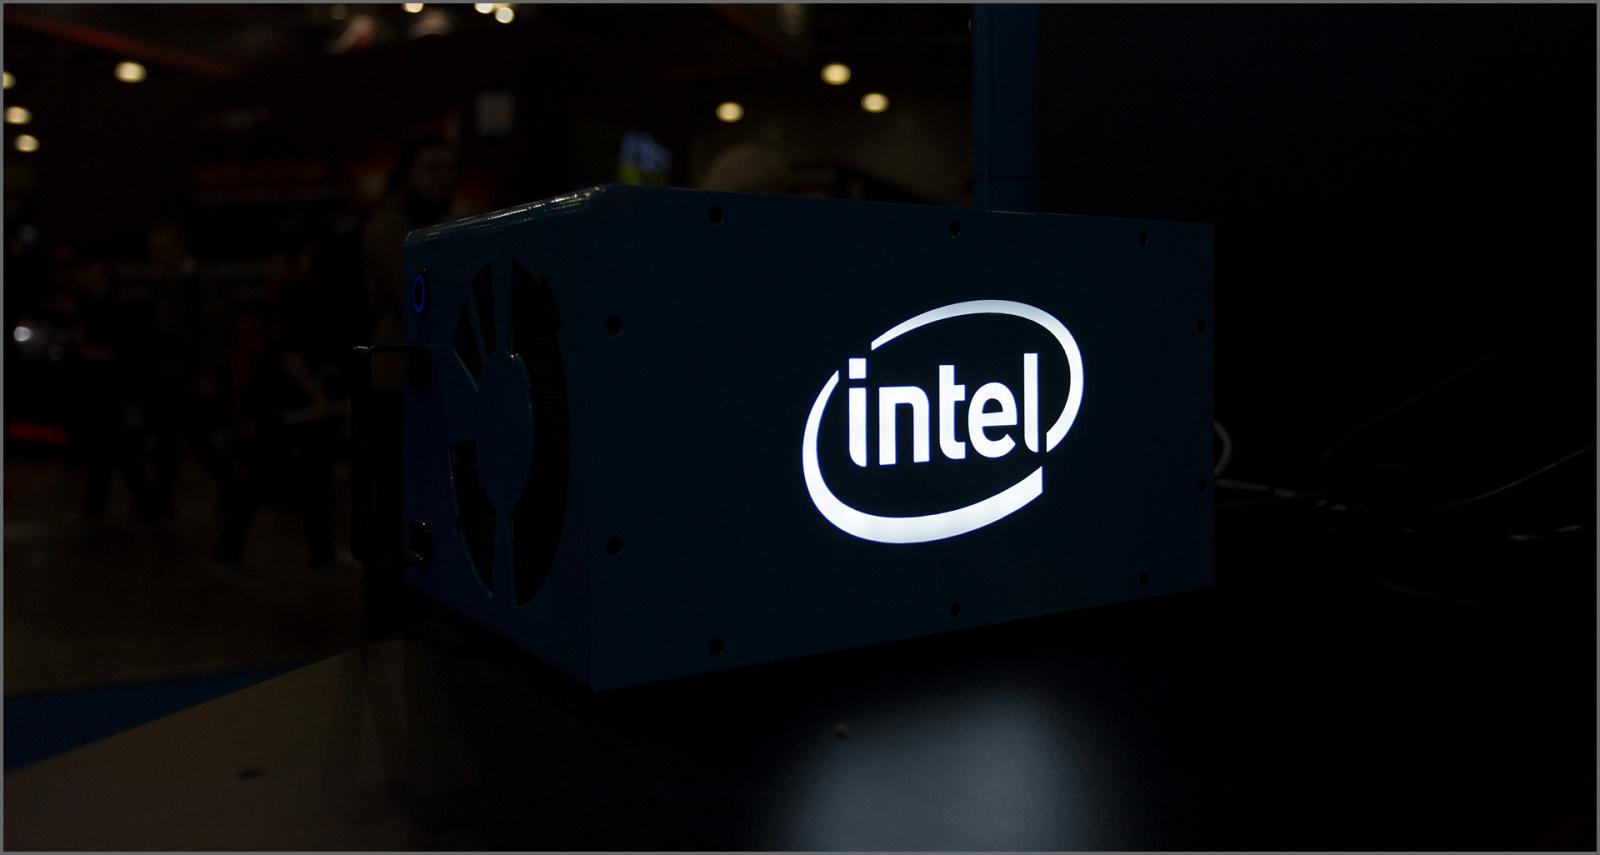 Intel значит побеждать: захват игромира прошёл успешно - 1